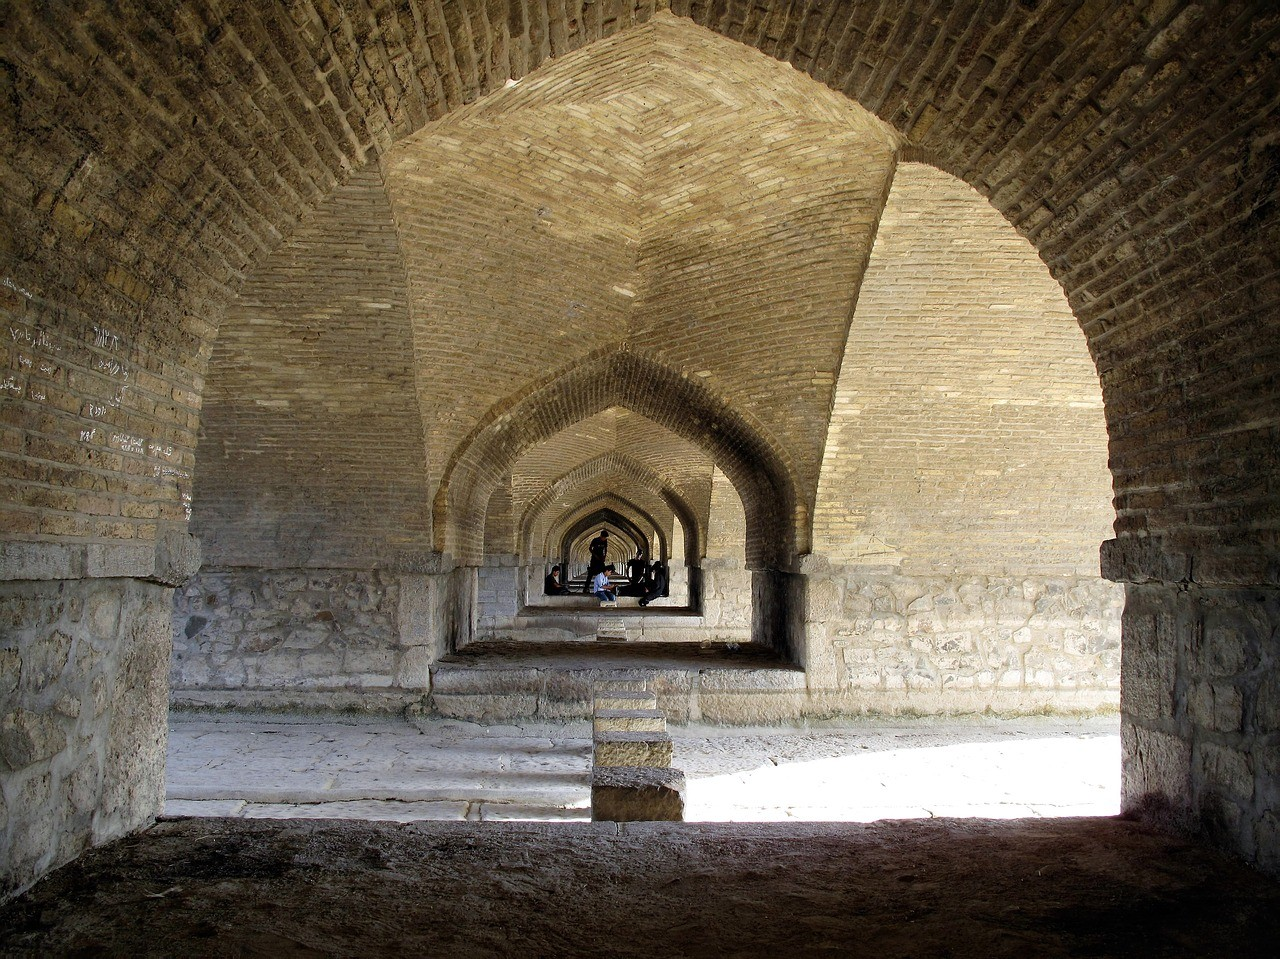 Мост Хаджу, Исфахан, Иран